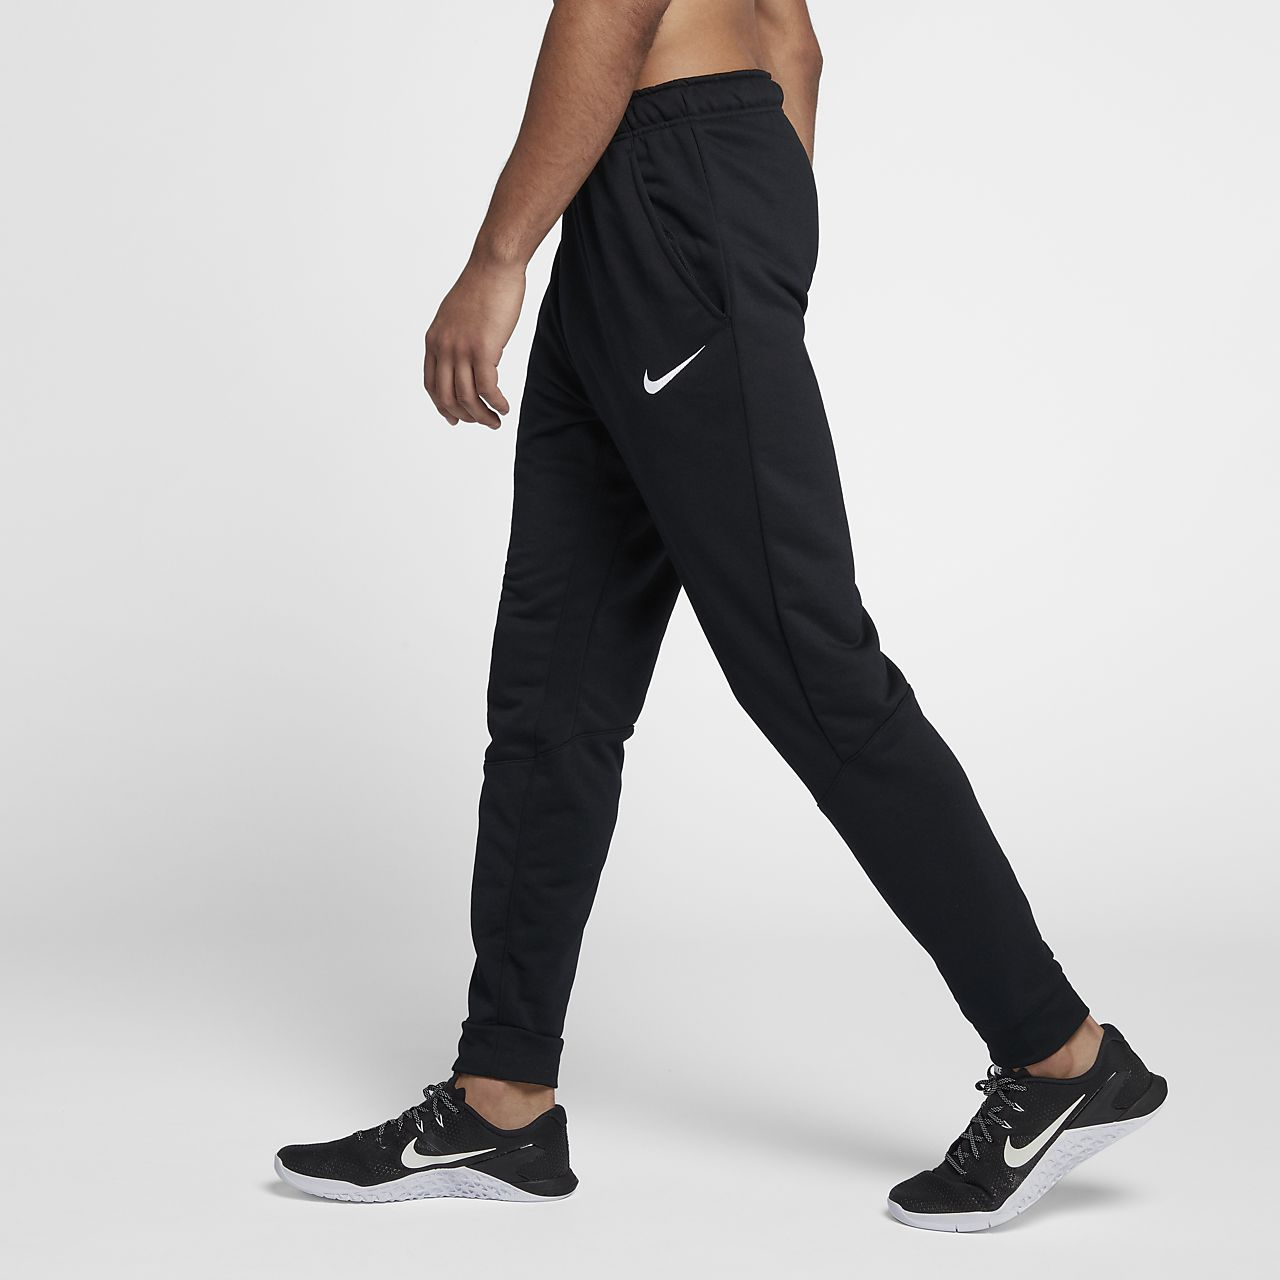 a1511b5fce Nike Dri-FIT Men s Tapered Fleece Training Trousers. Nike.com GB